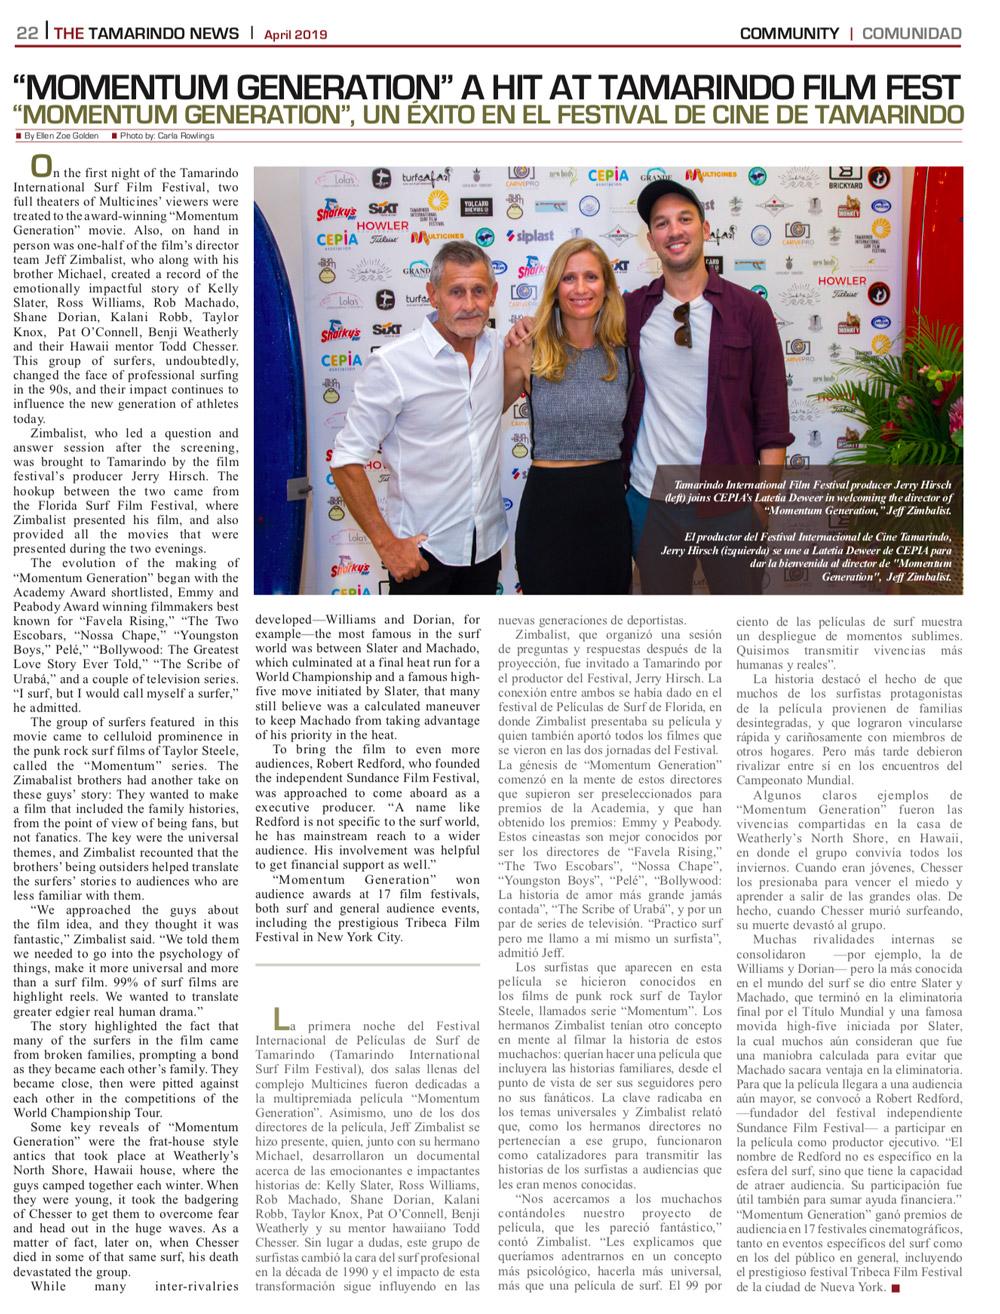 Tamarindo-News-Film-Festival-3.jpg